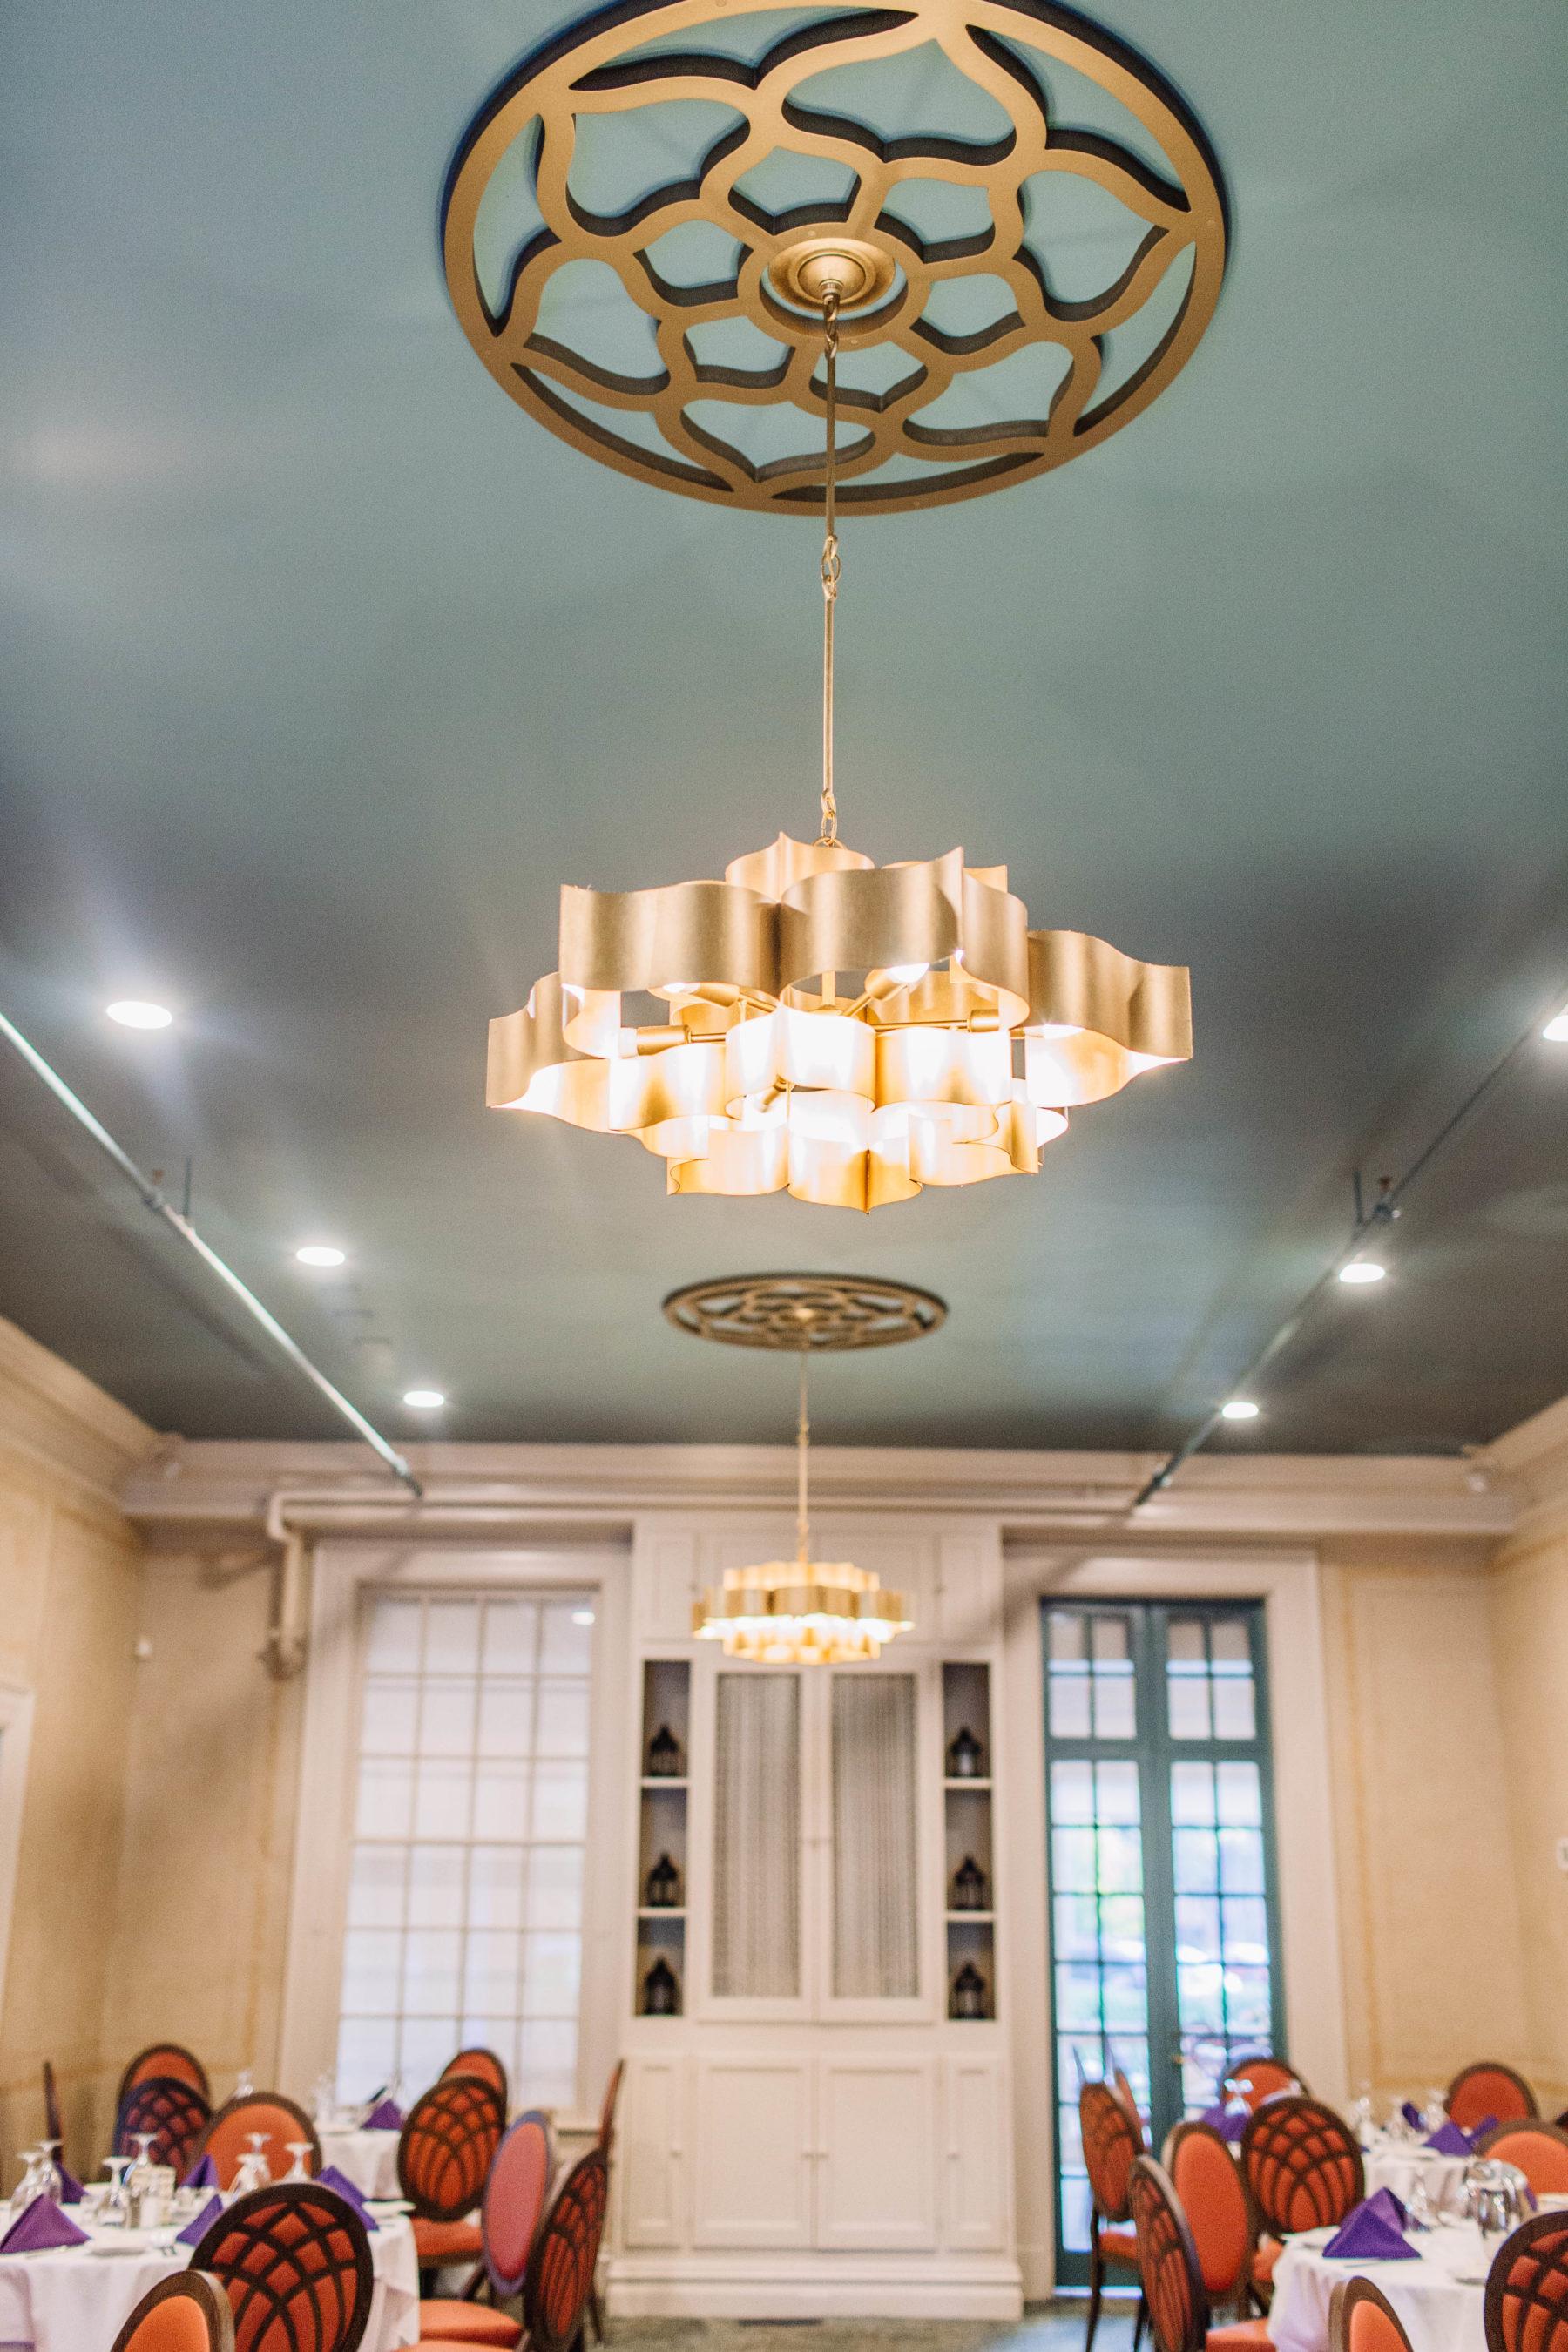 Nashville rehearsal dinner space renovations featured on Nashville Bride Guide